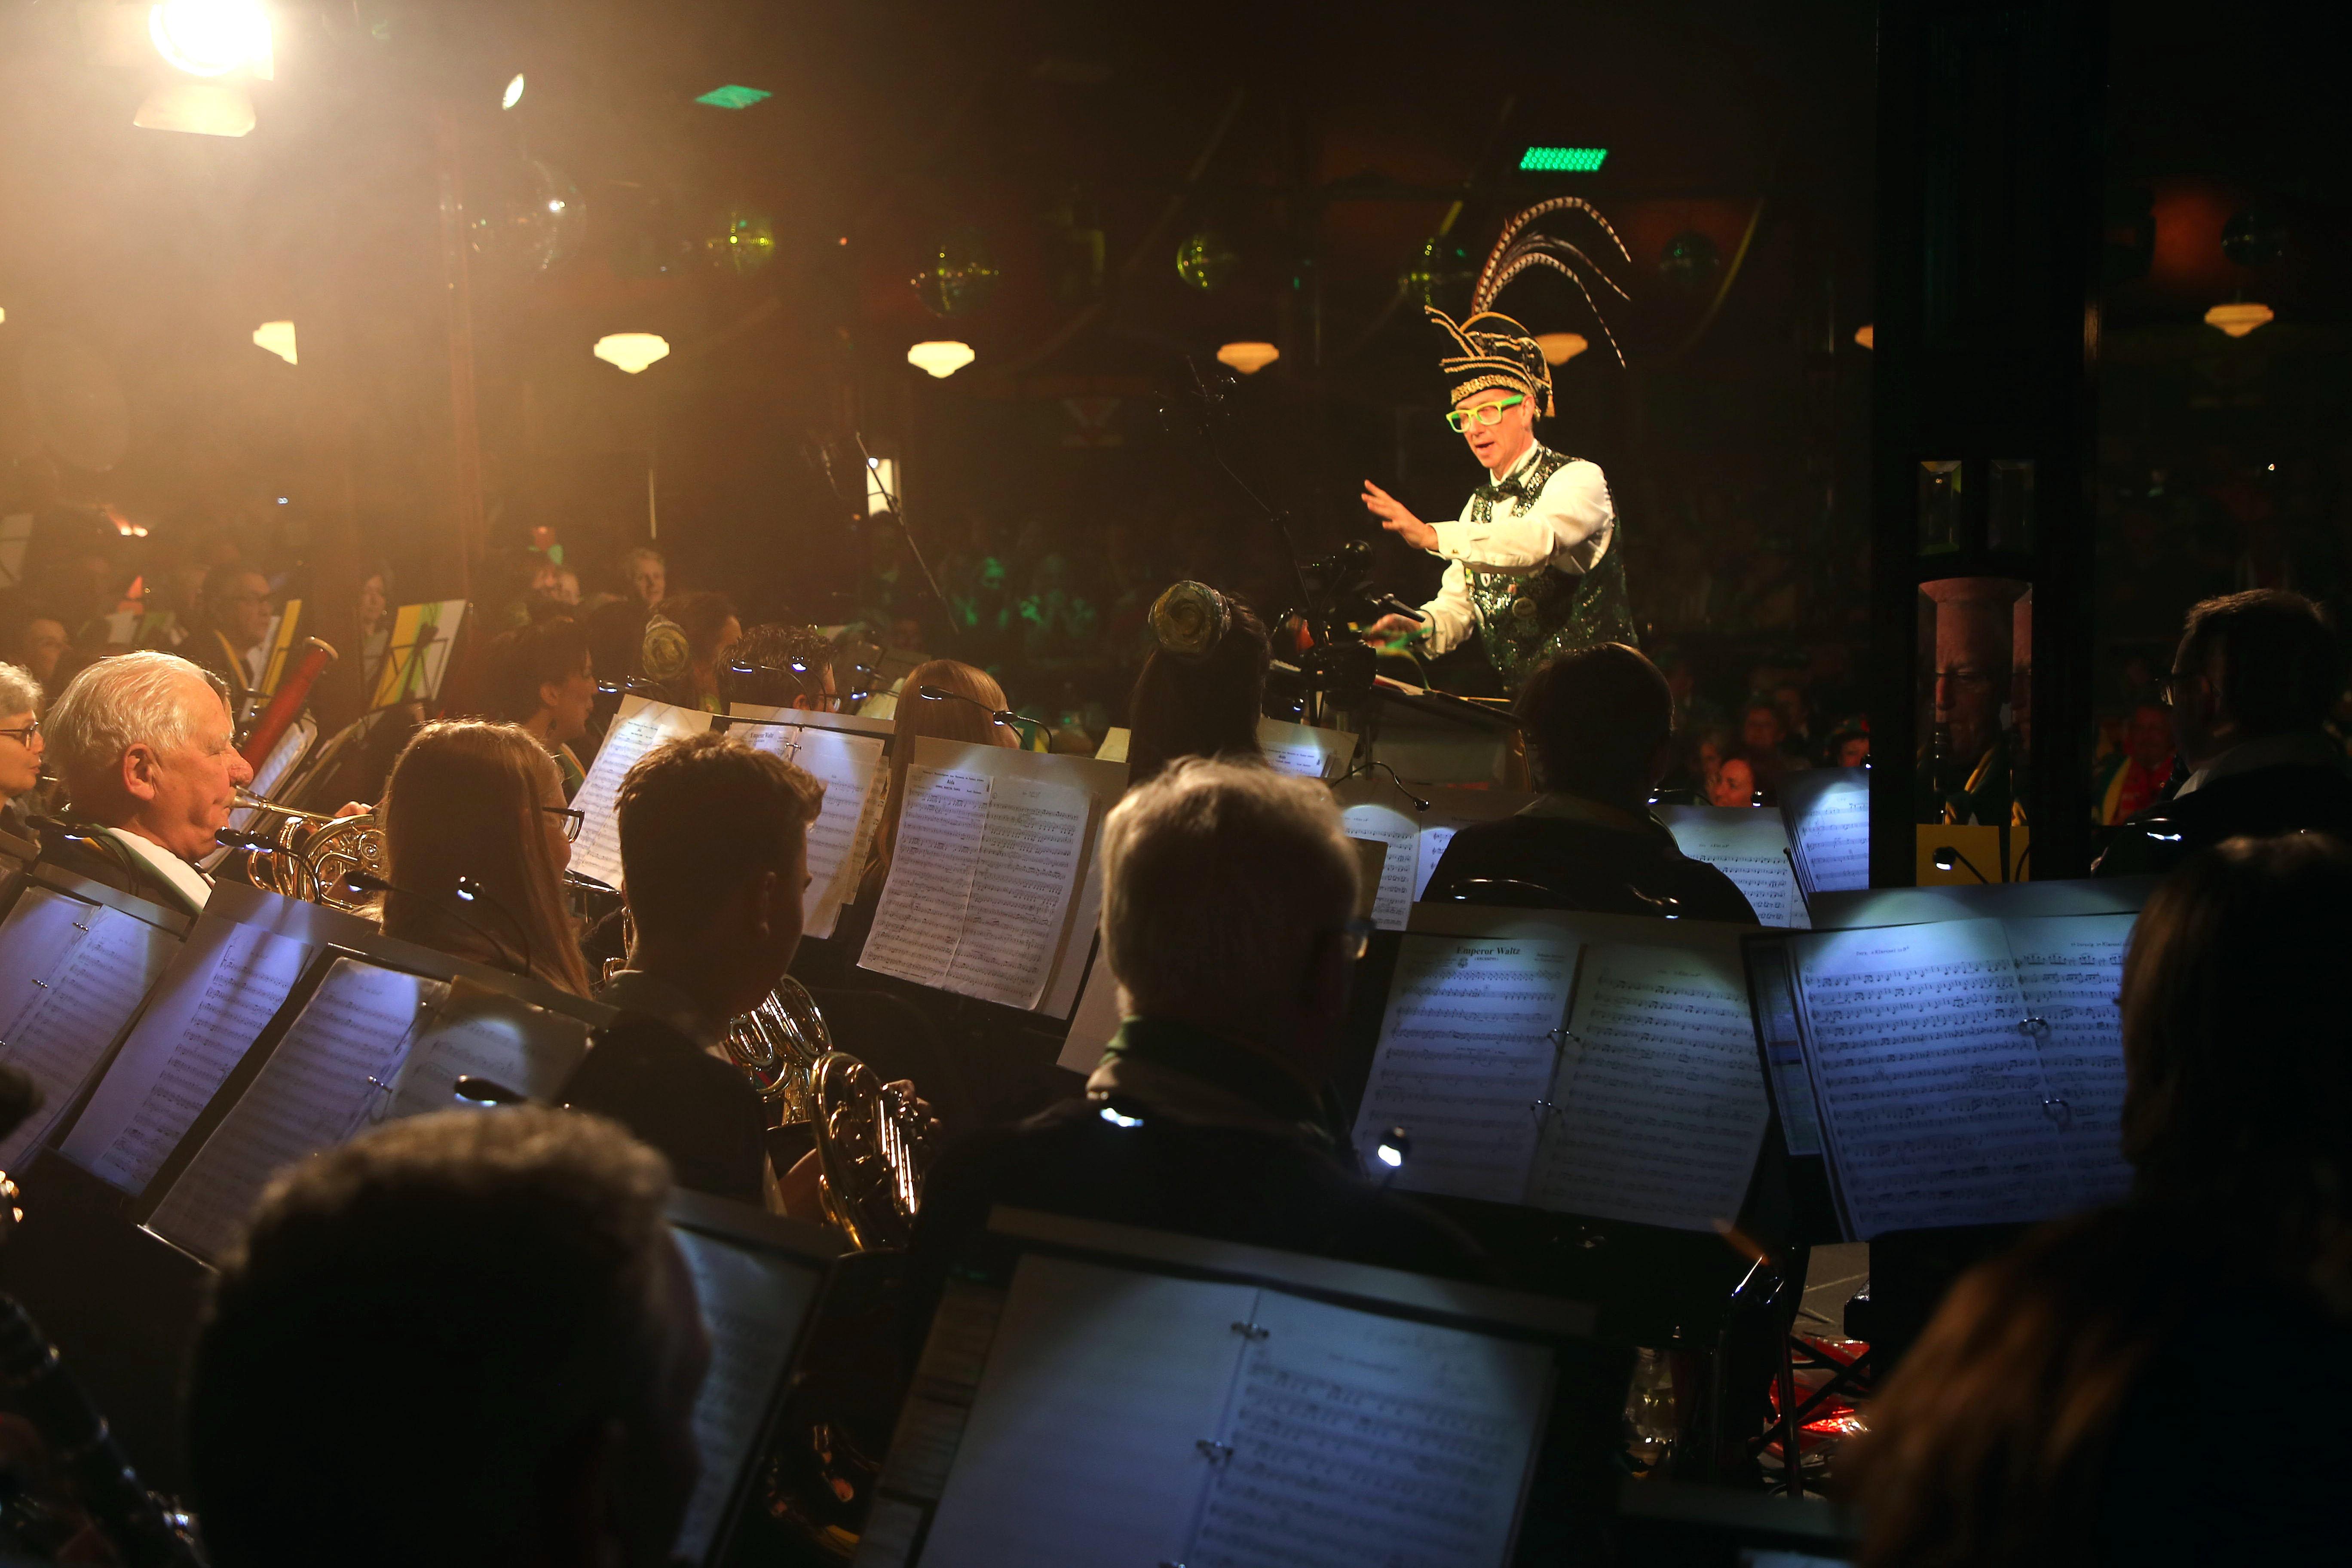 Concert Carnavalesk, Harmonie Sint Cecilia